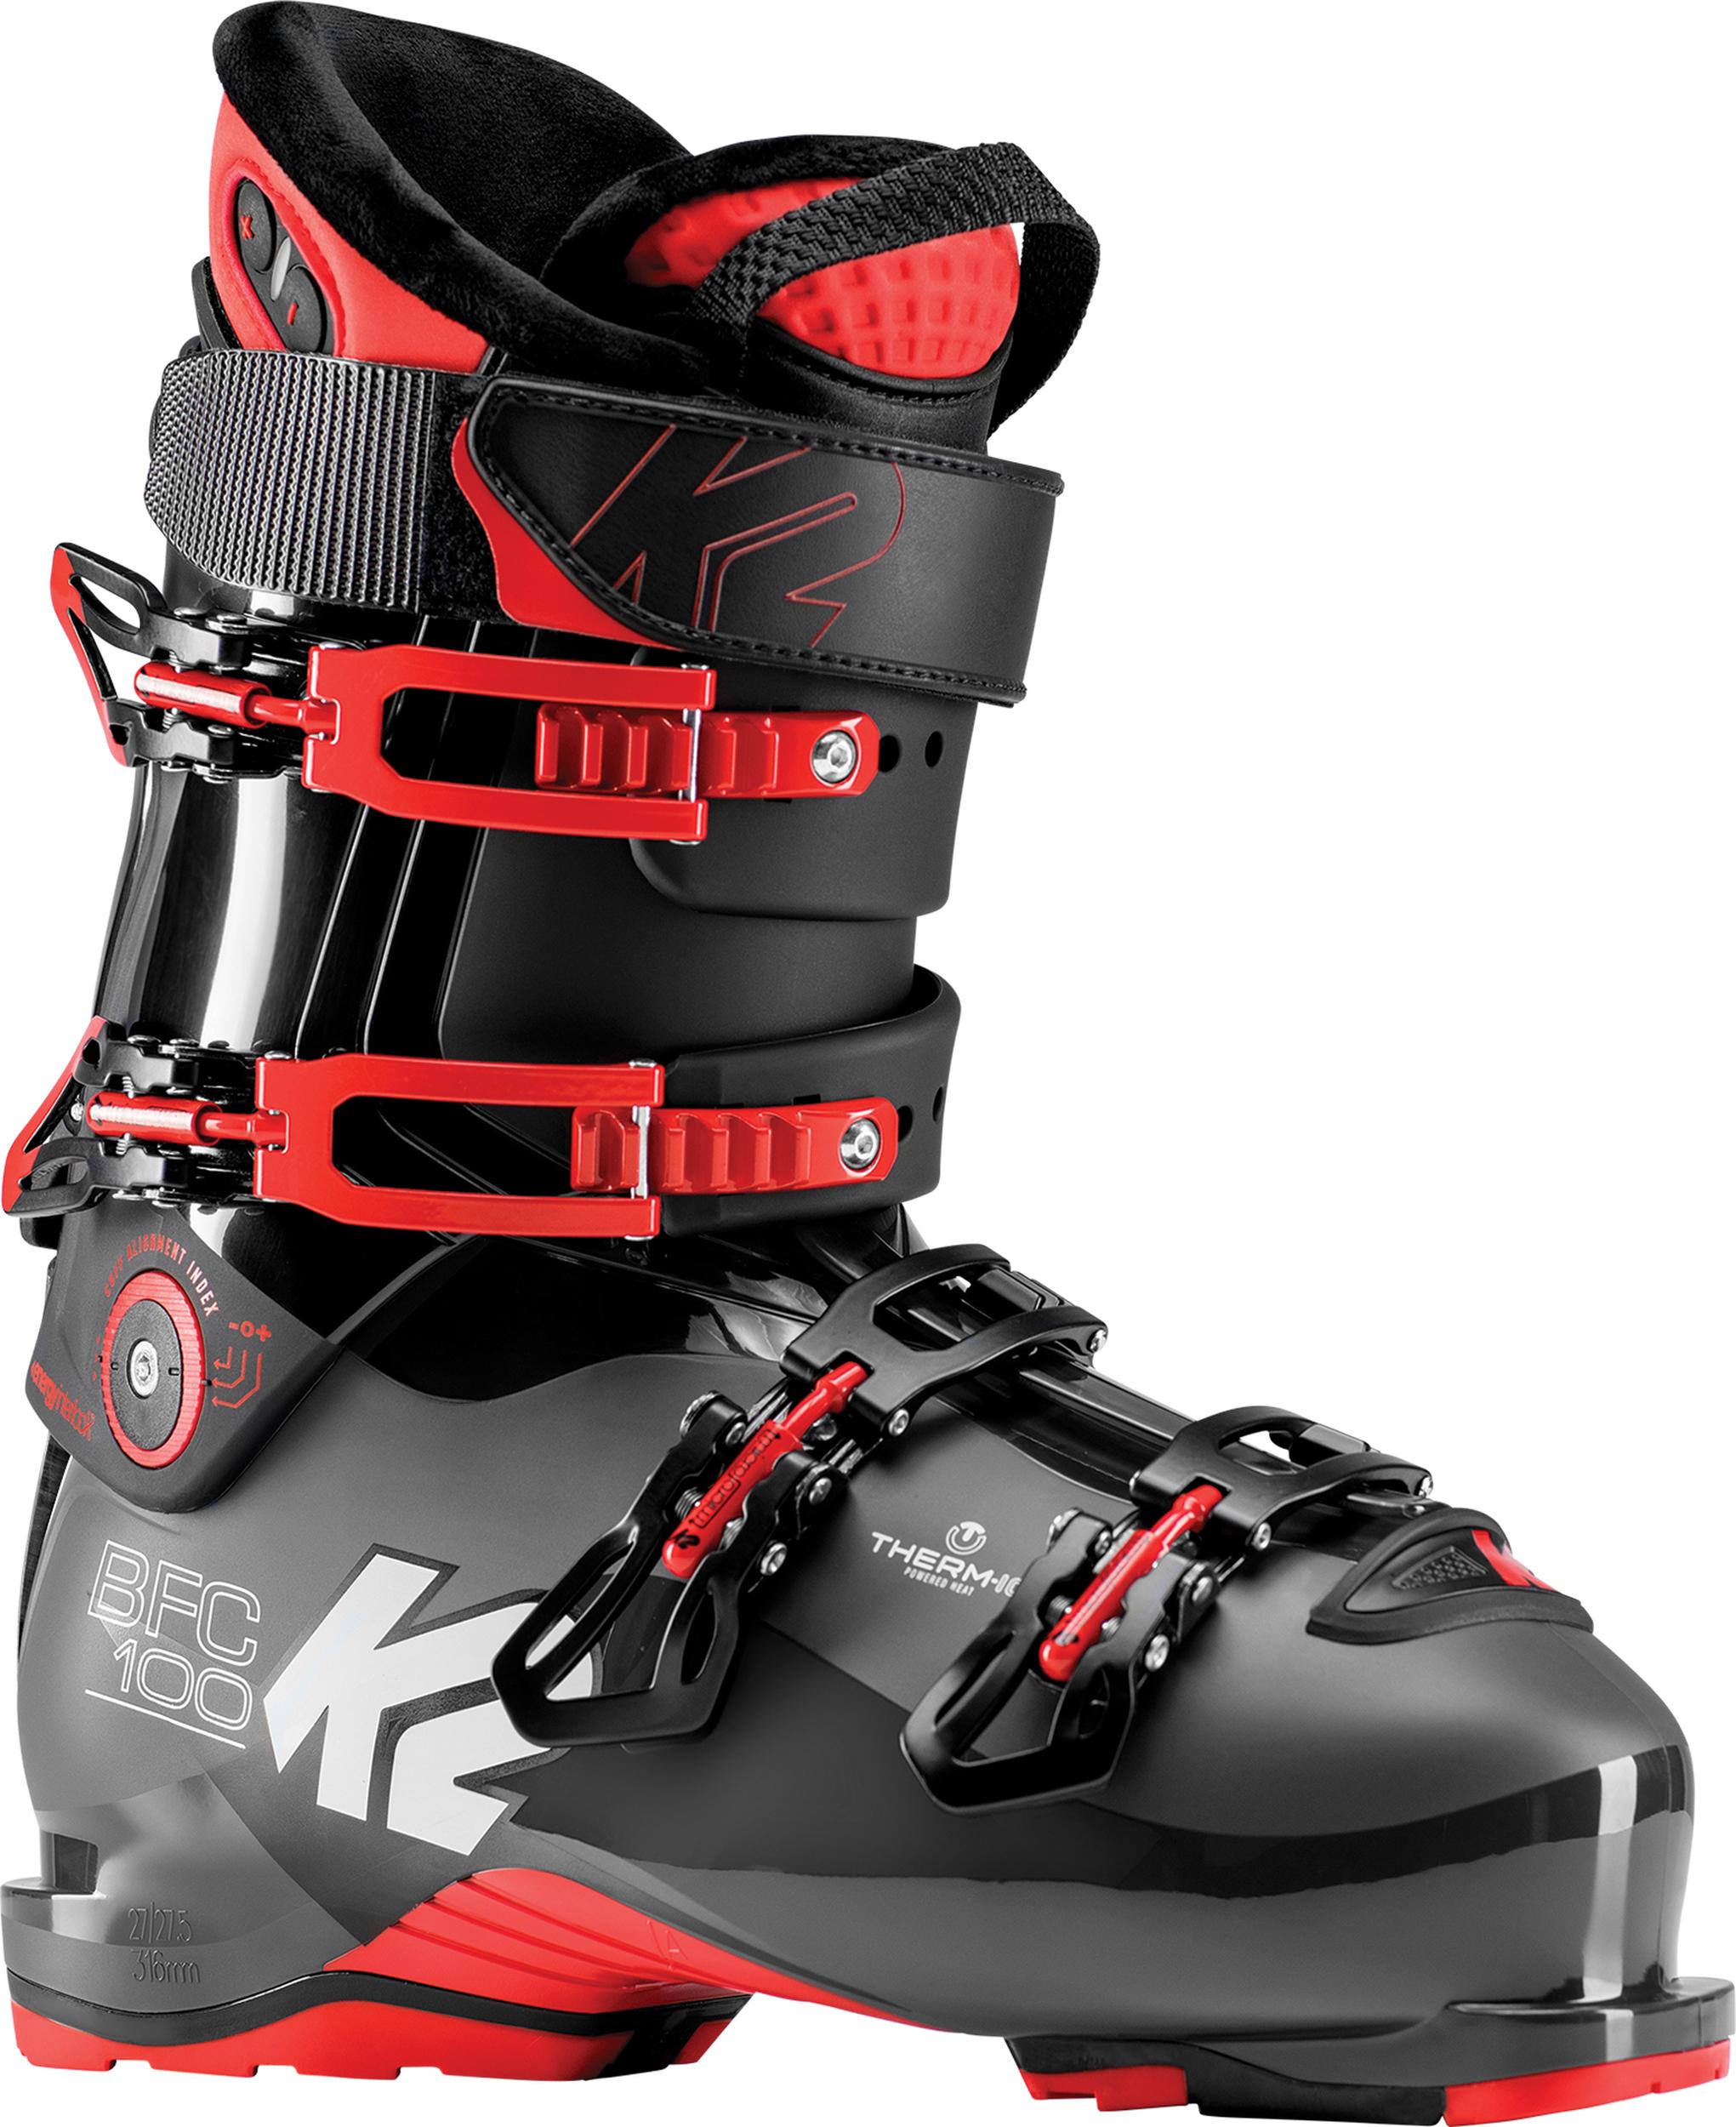 K2 B.F.C. 100 Heat Ski Boot, 25/25.5 2018